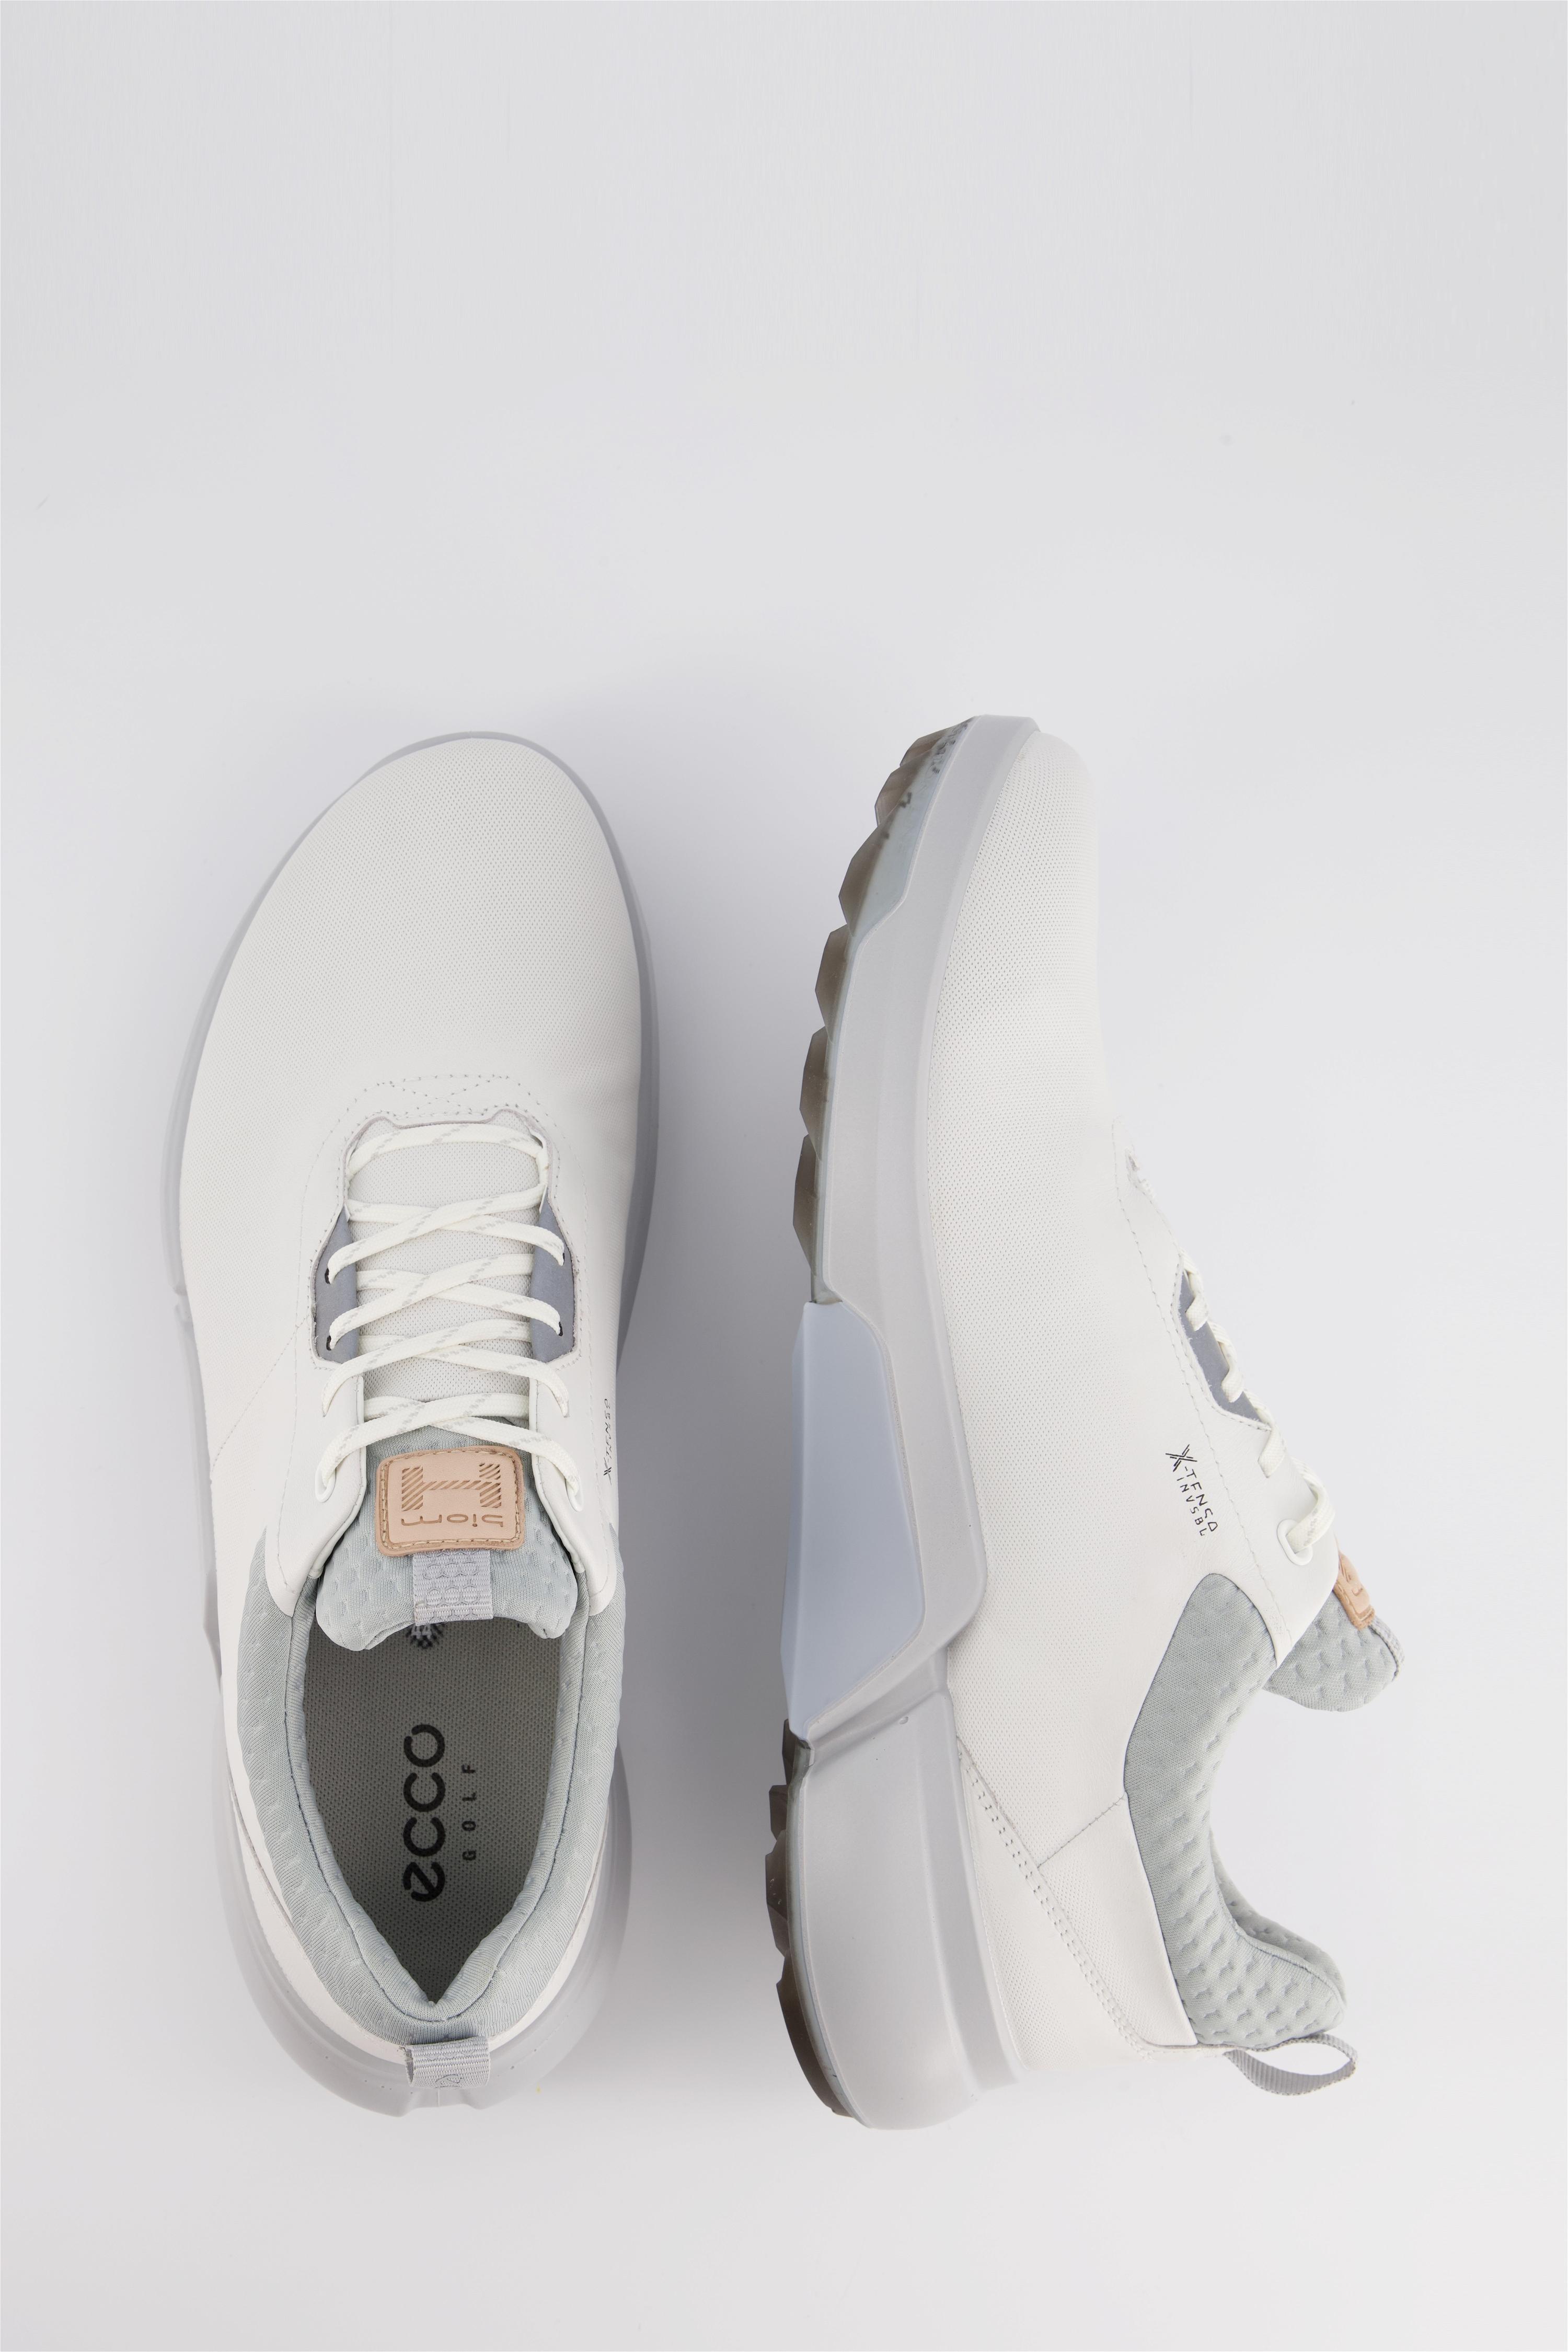 Golf Biom H4